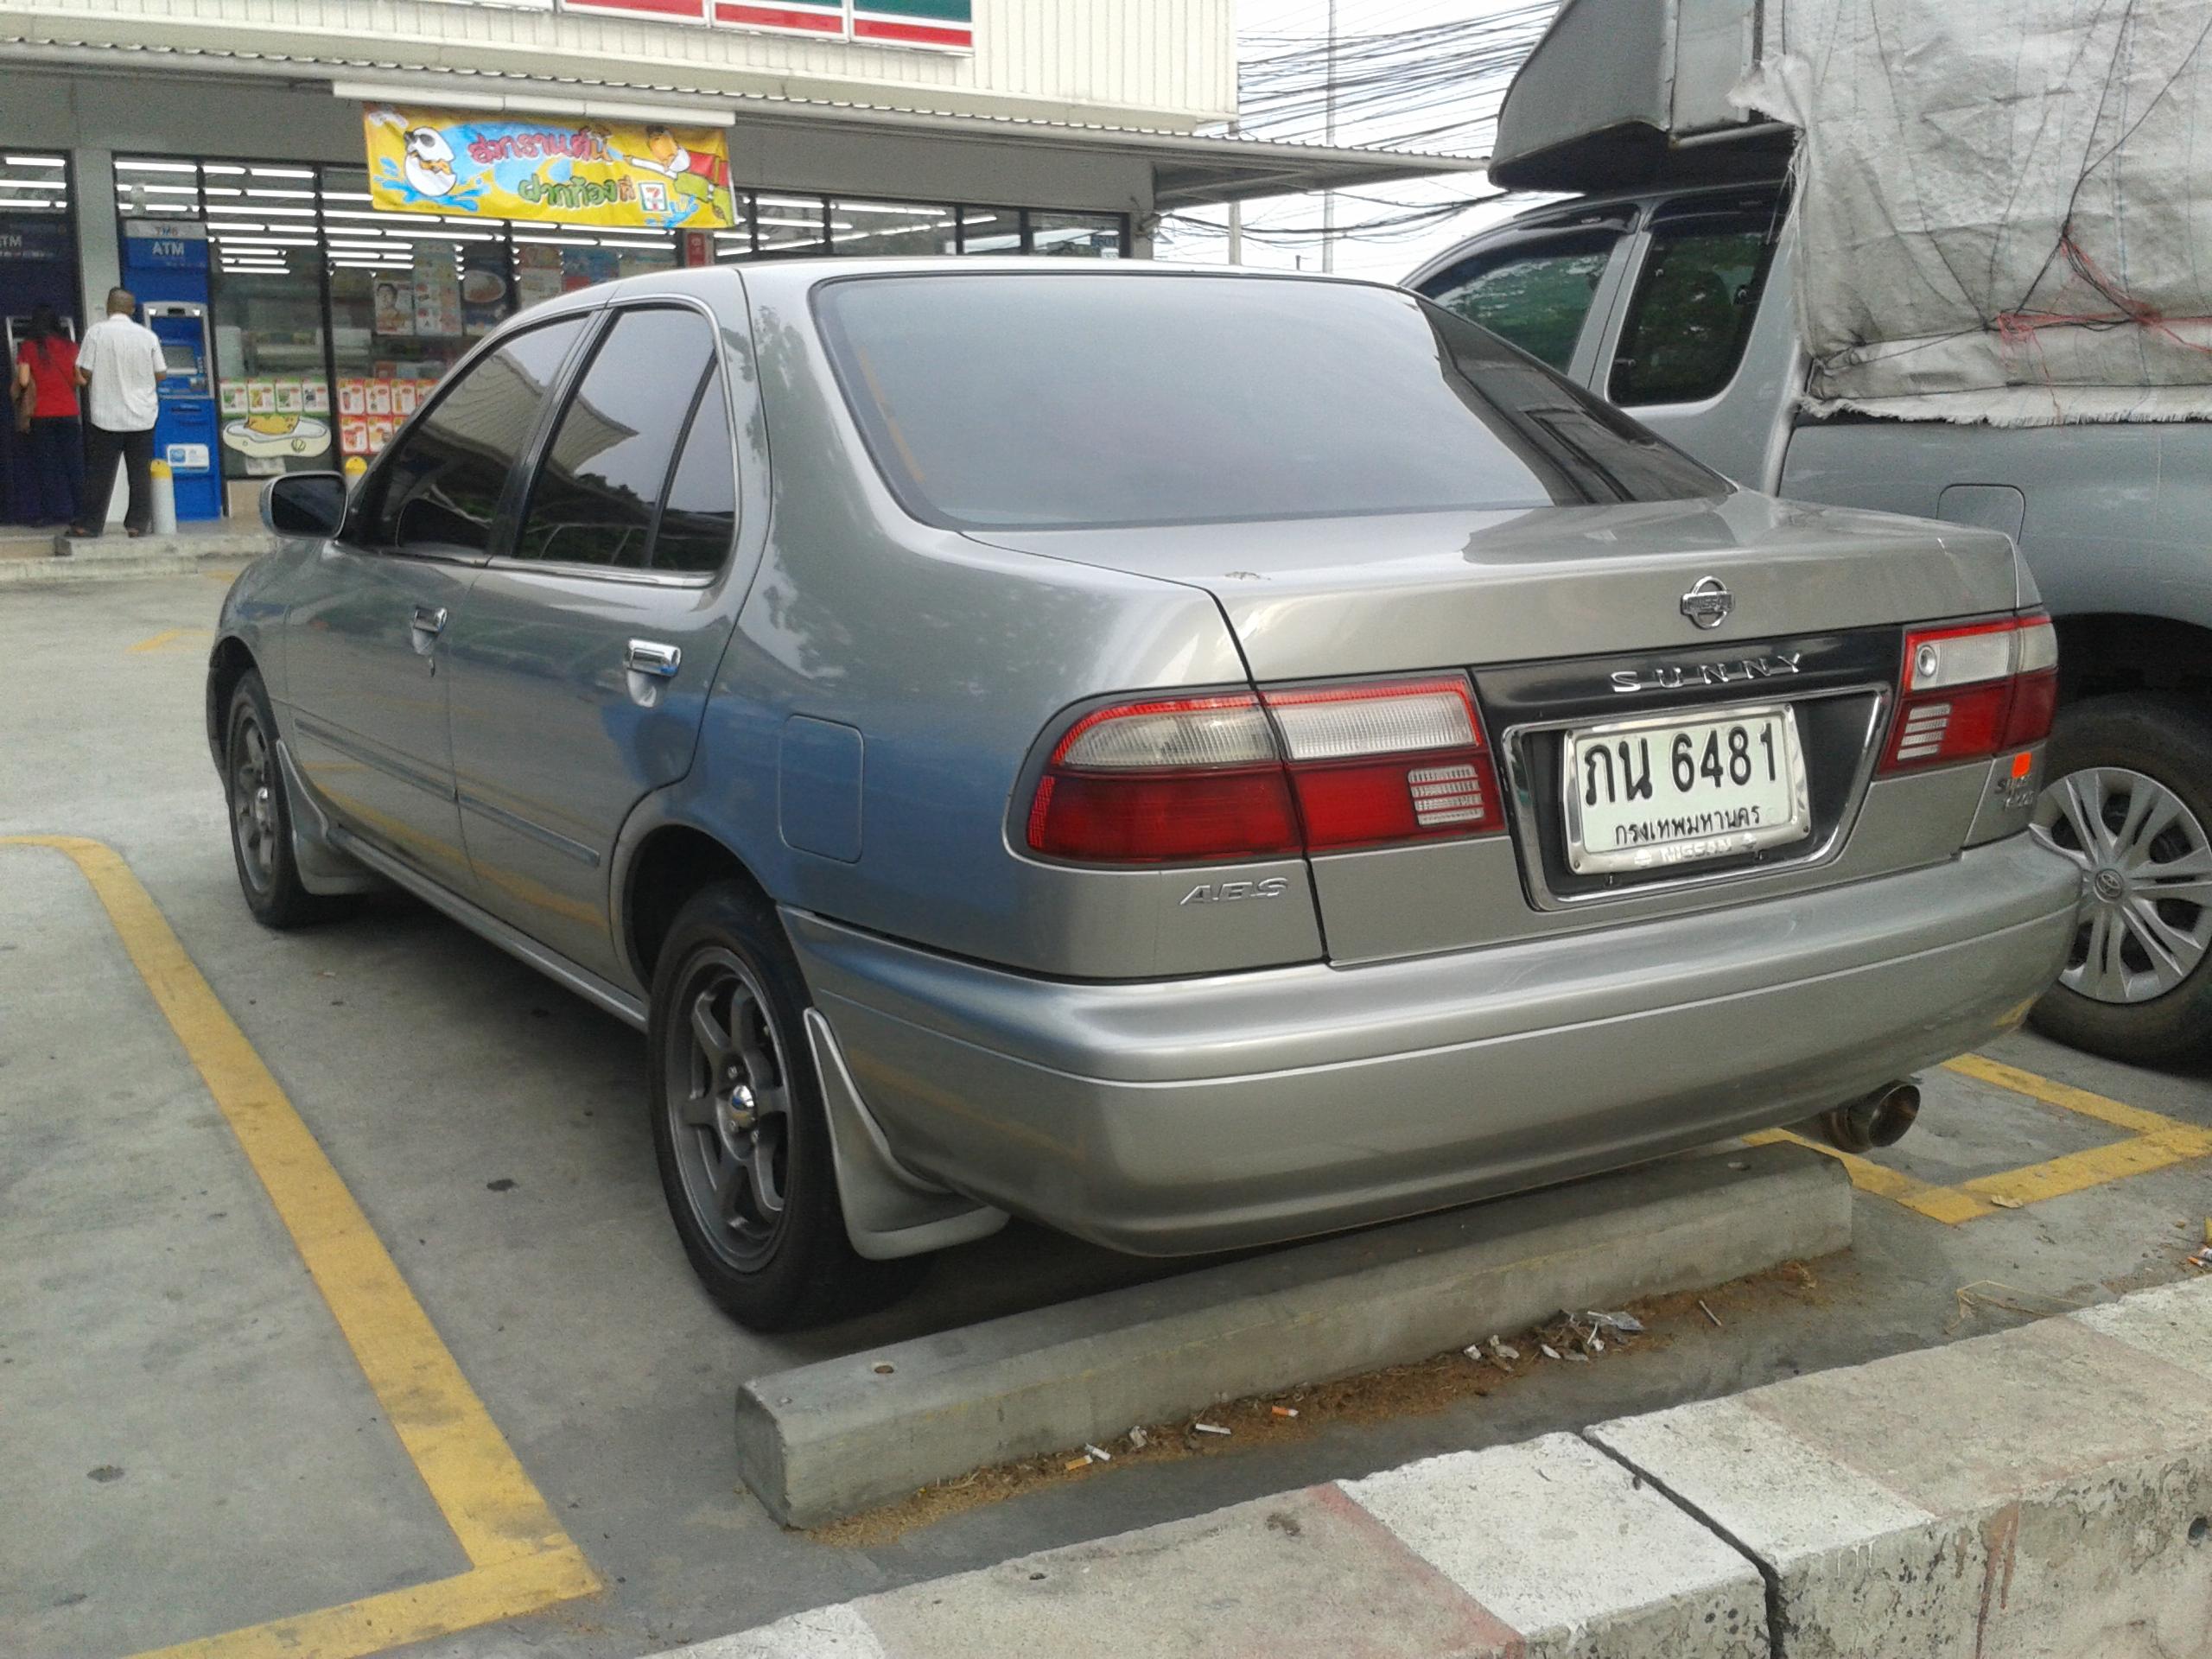 File:Tuned Nissan Sunny (B14) Super Saloon ABS 03 jpg - Wikimedia